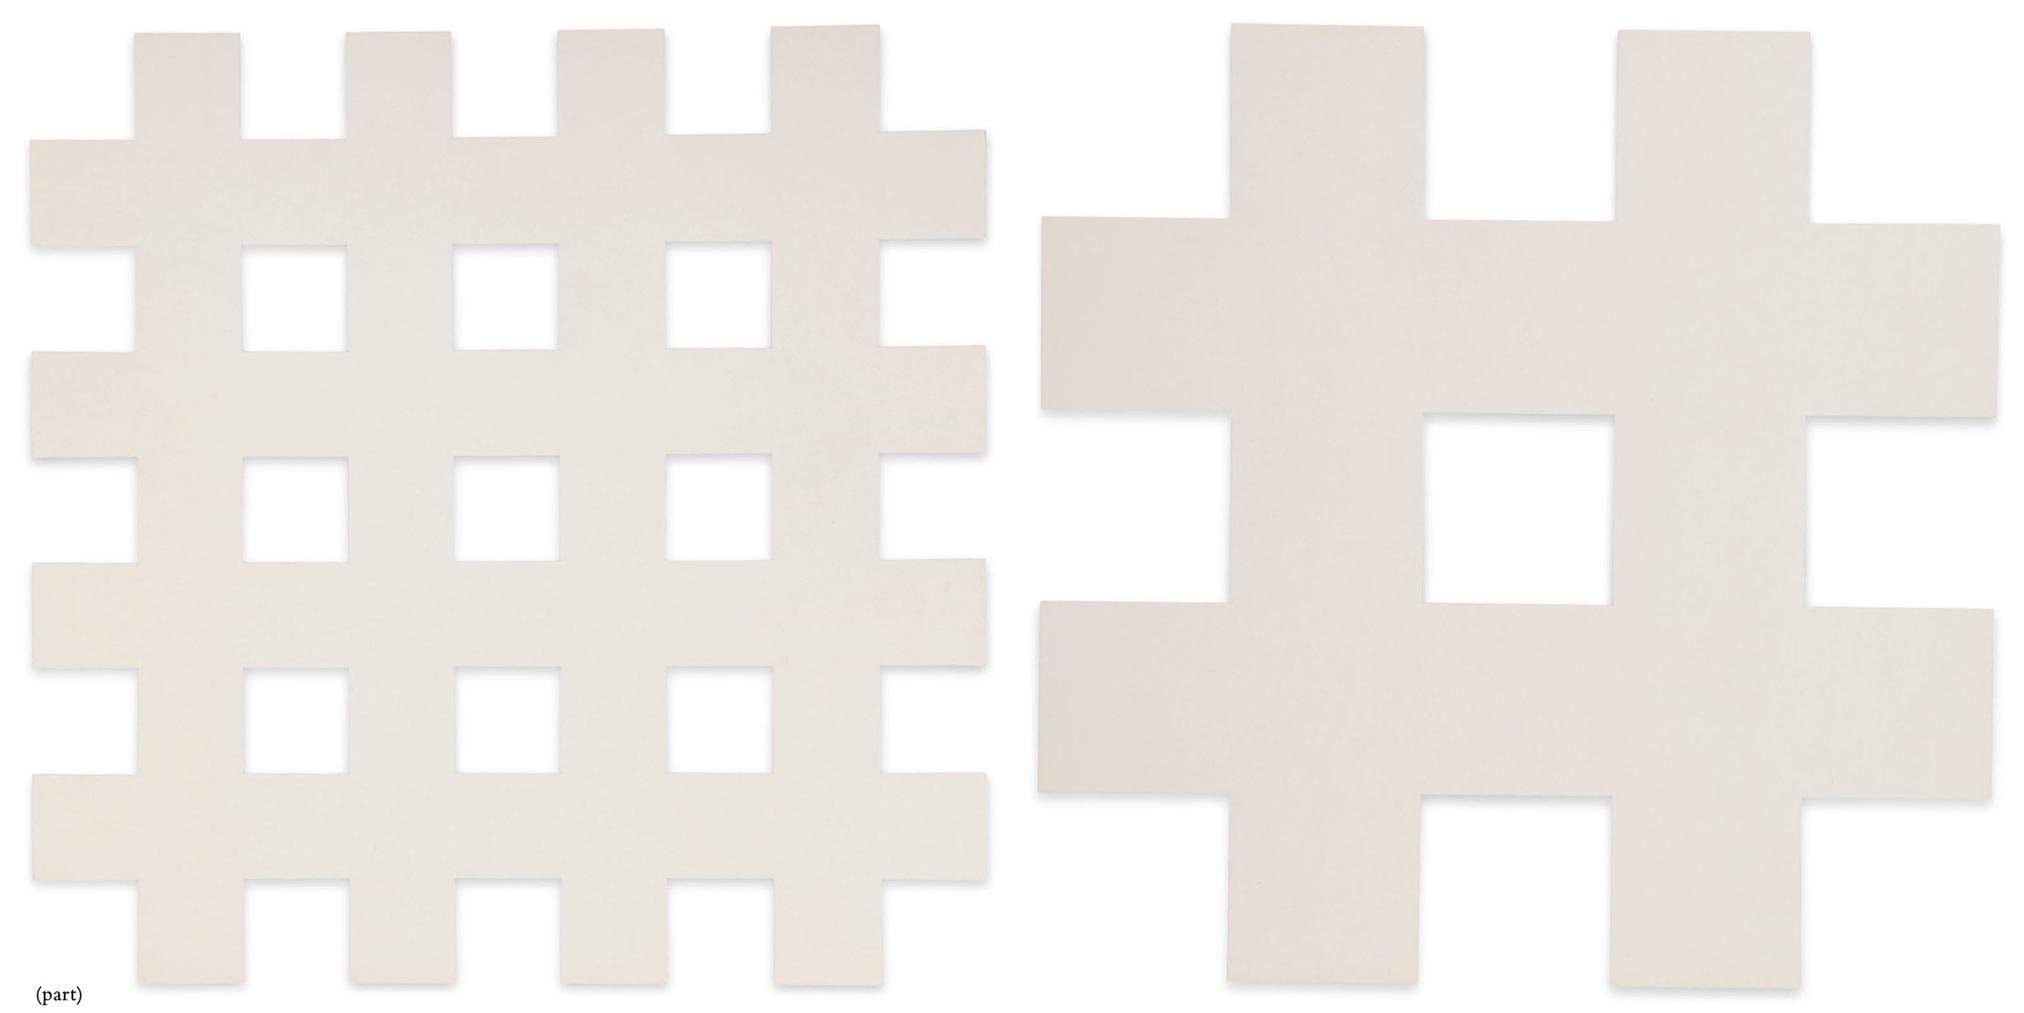 Ewerdt Hilgemann - 4 X 2 Reliefs-1971